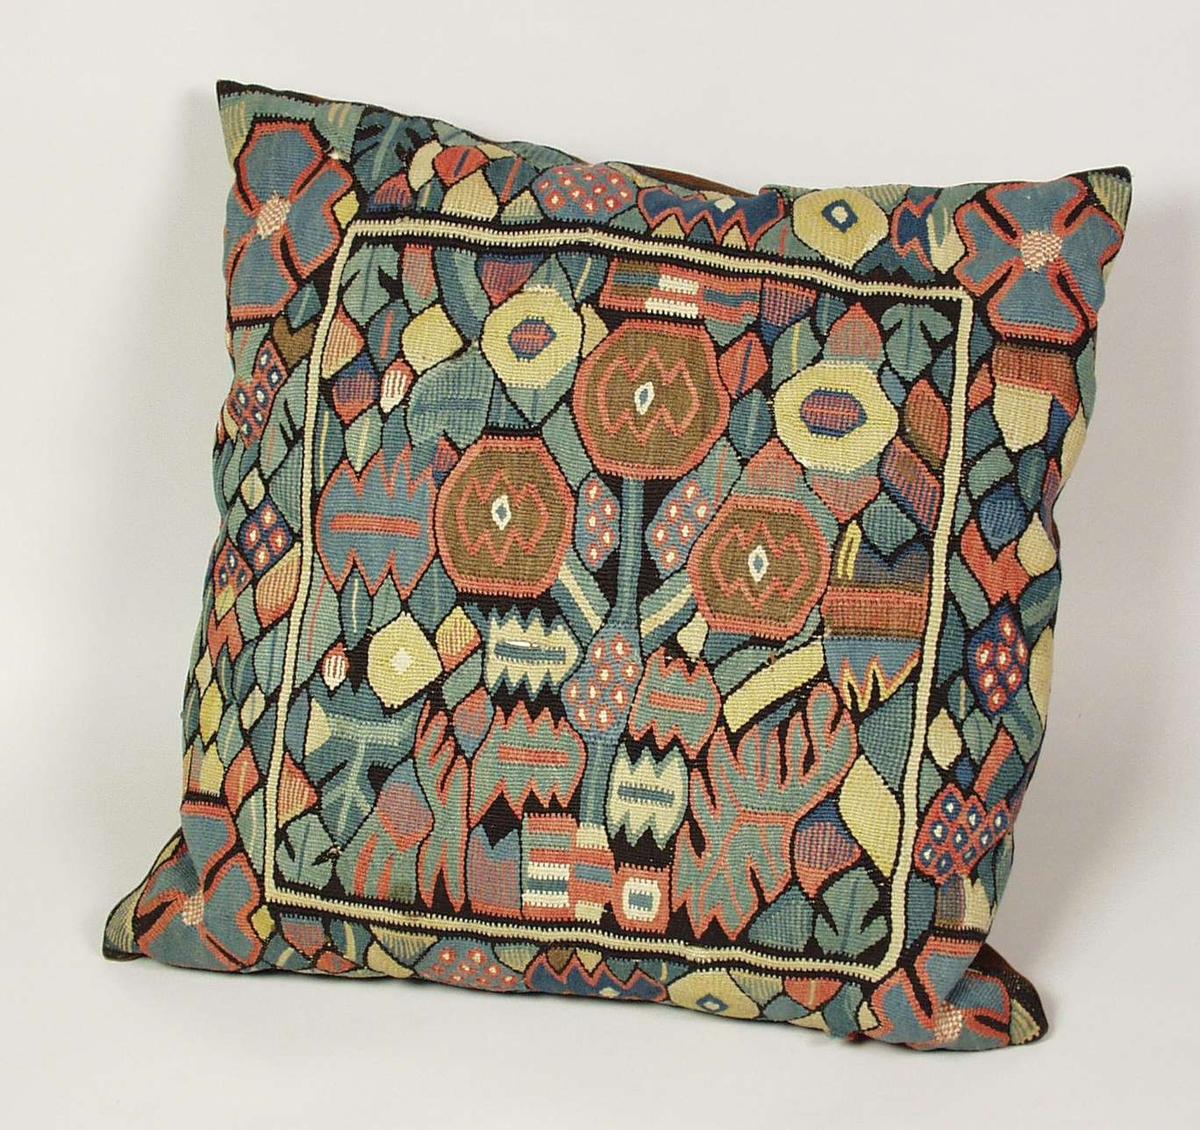 Sofapute i billedvev med Gerhard Munthe-lignende mønster.Det er brukt plantefarger. Det er enkelte hull i billedveven. Baksiden er brun.